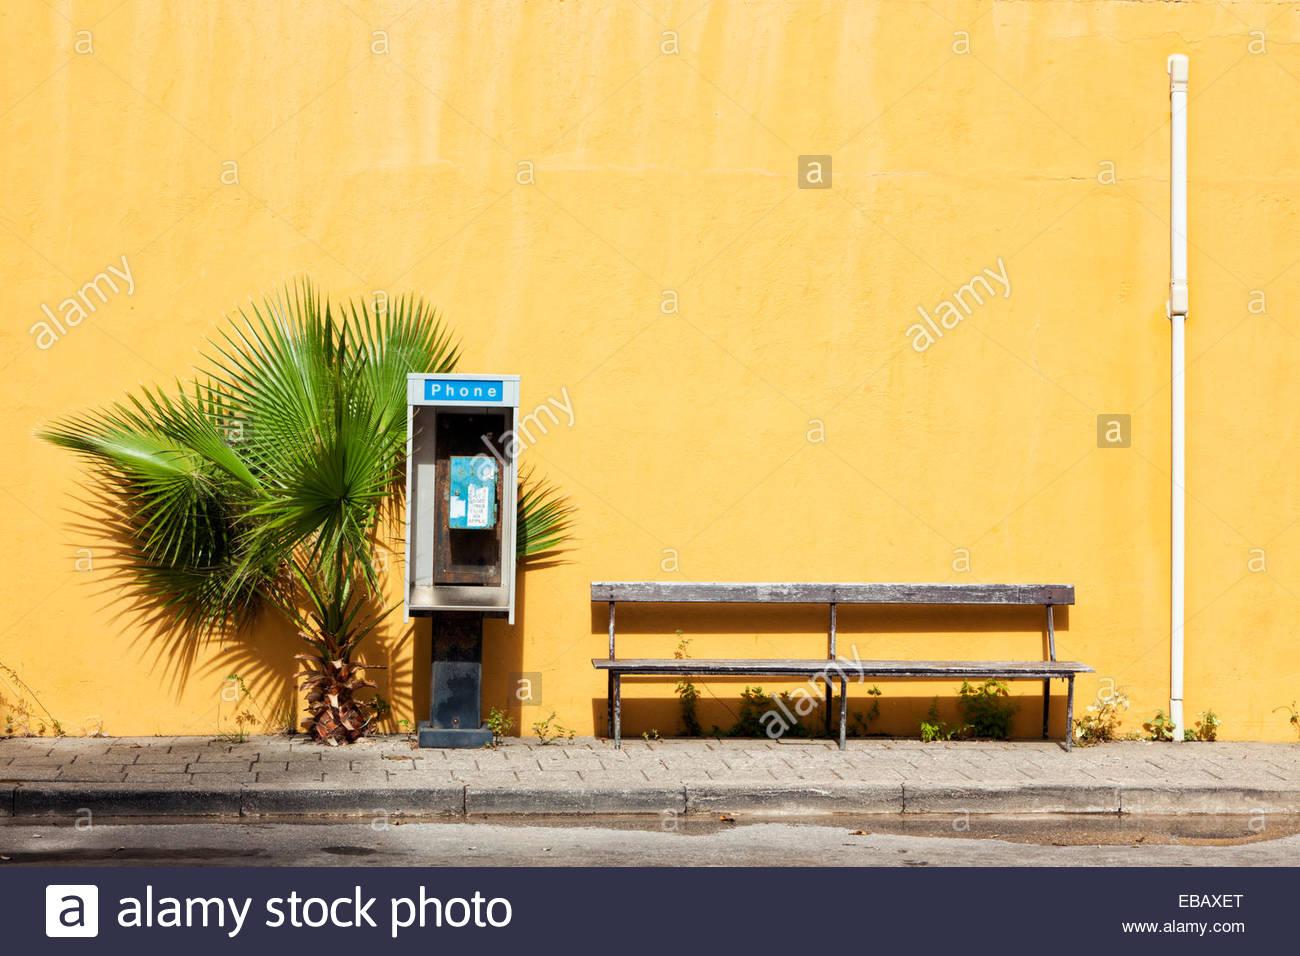 Rotture di cabina telefonica, Palm tree e bancone di orange parete dipinta, Willemstad, Curaçao Immagini Stock